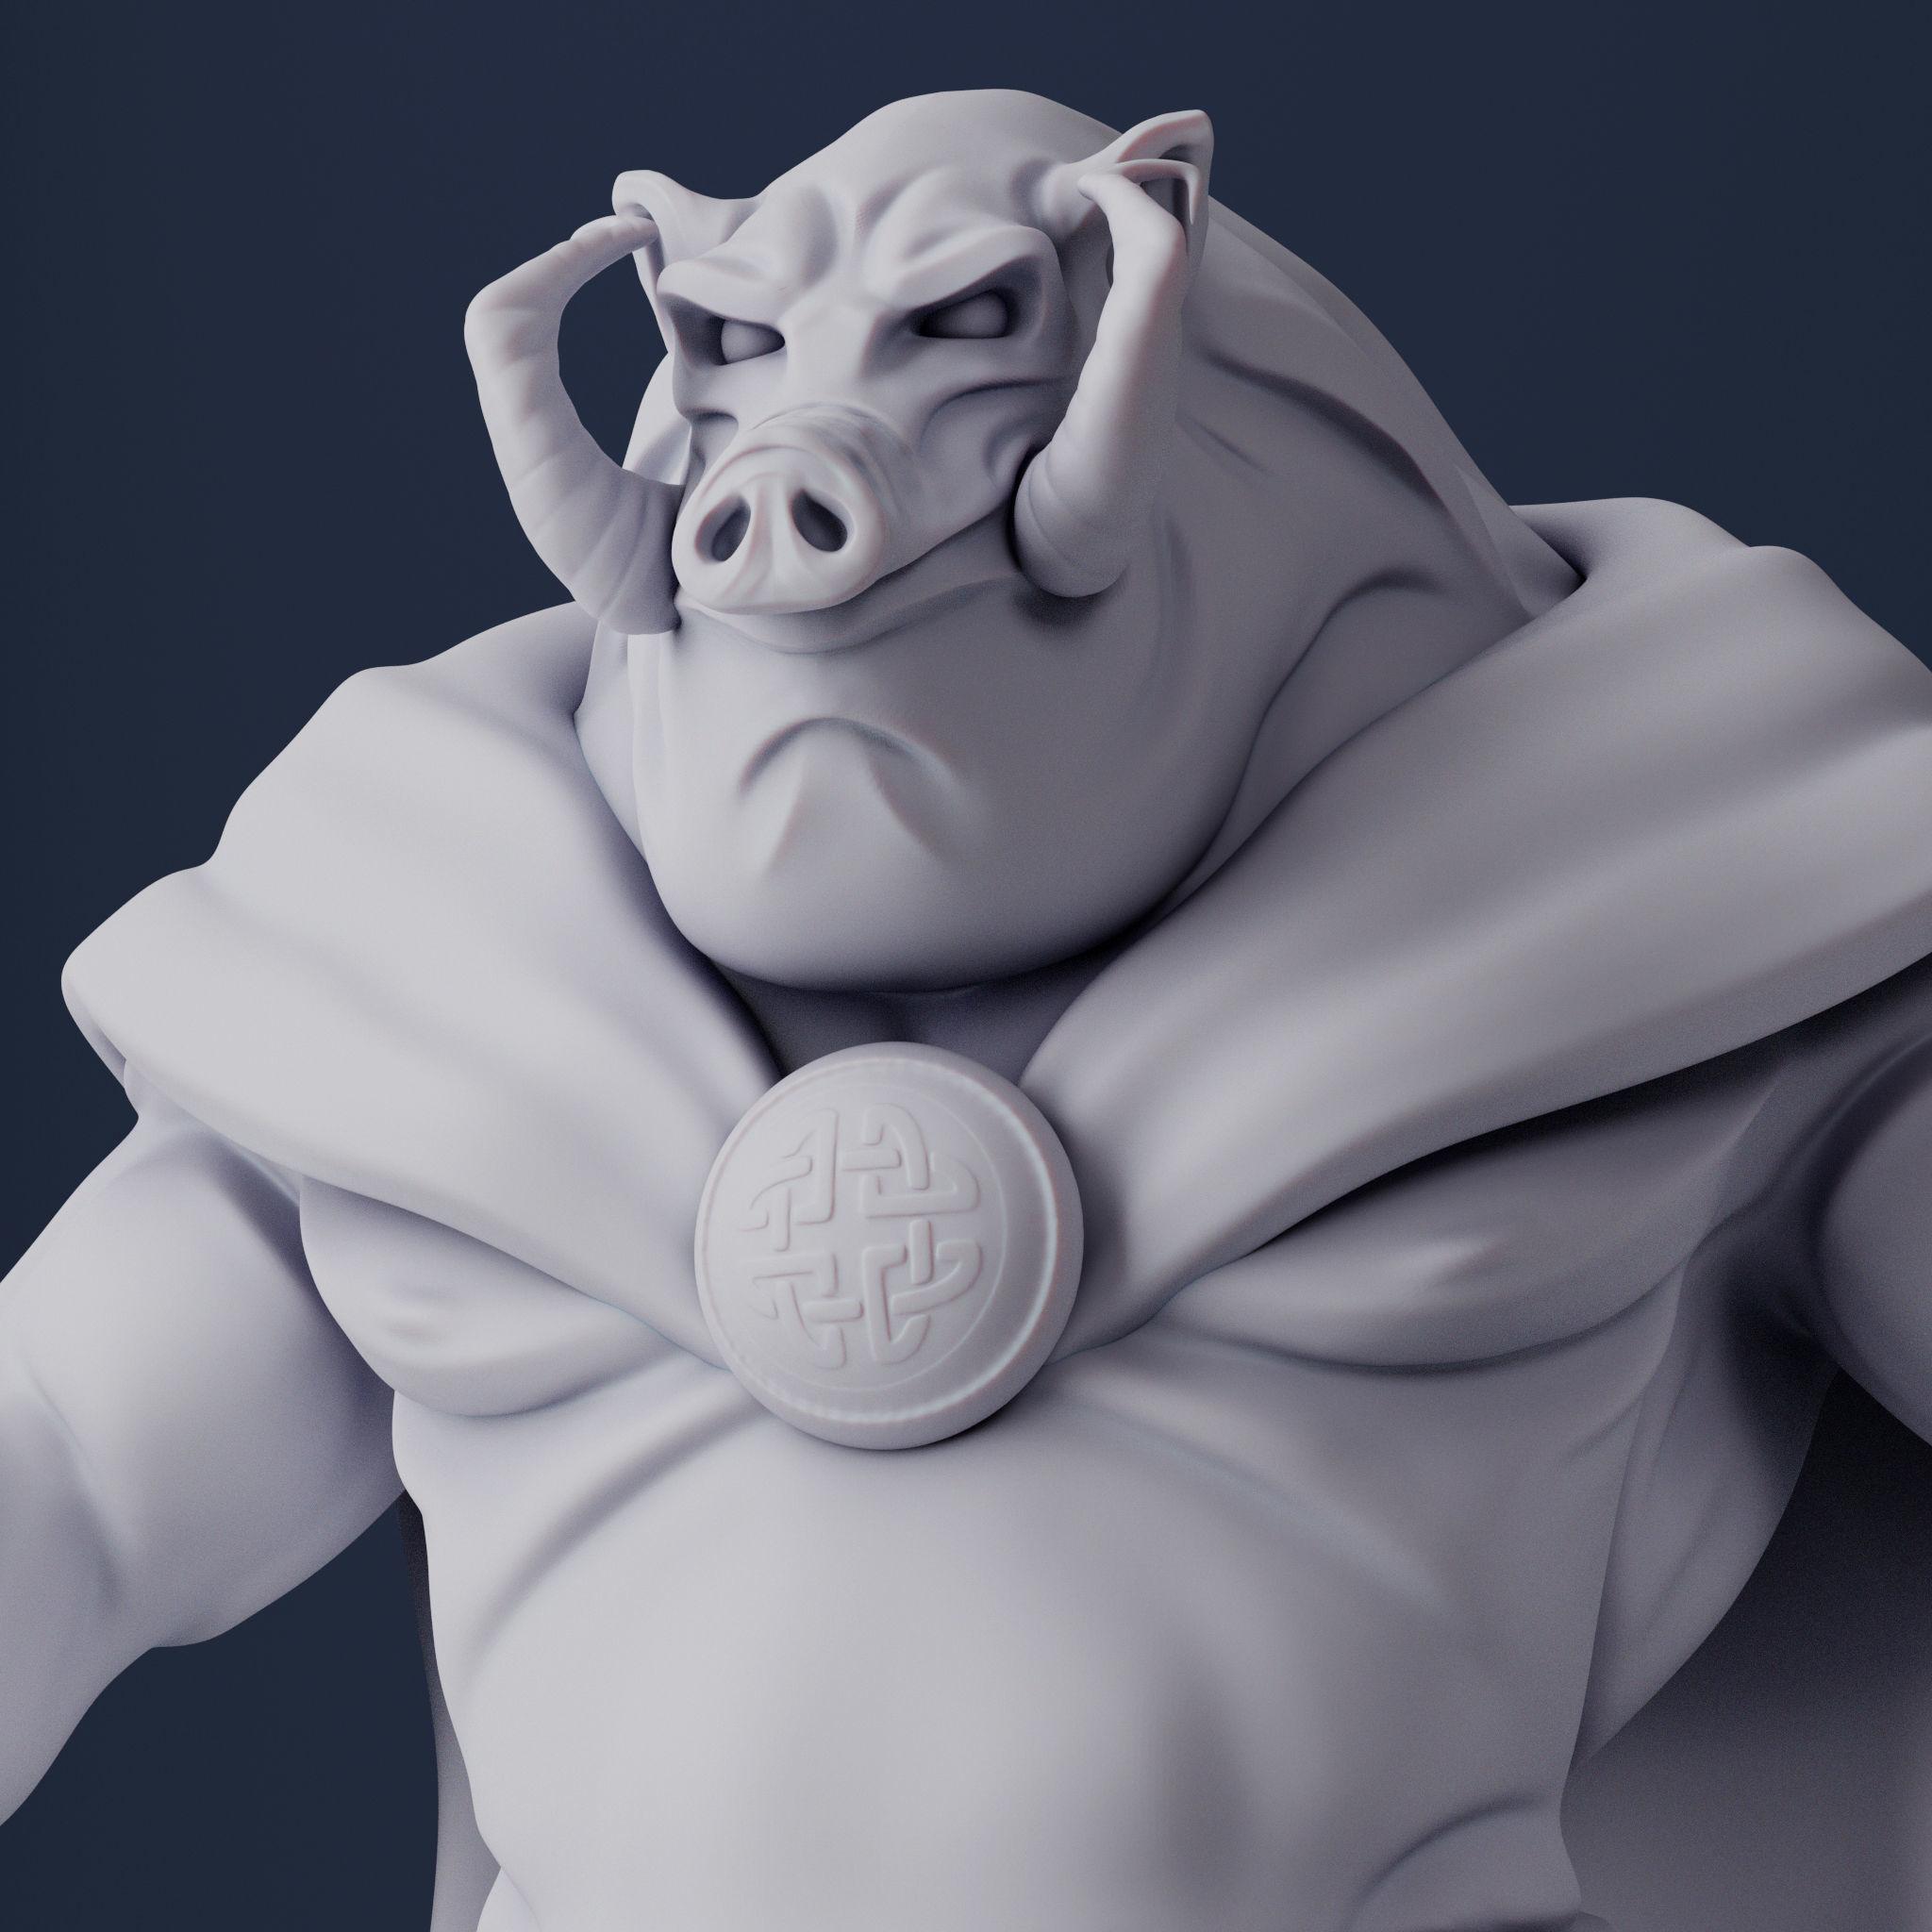 Aerosmith The Boar 3D Print Model